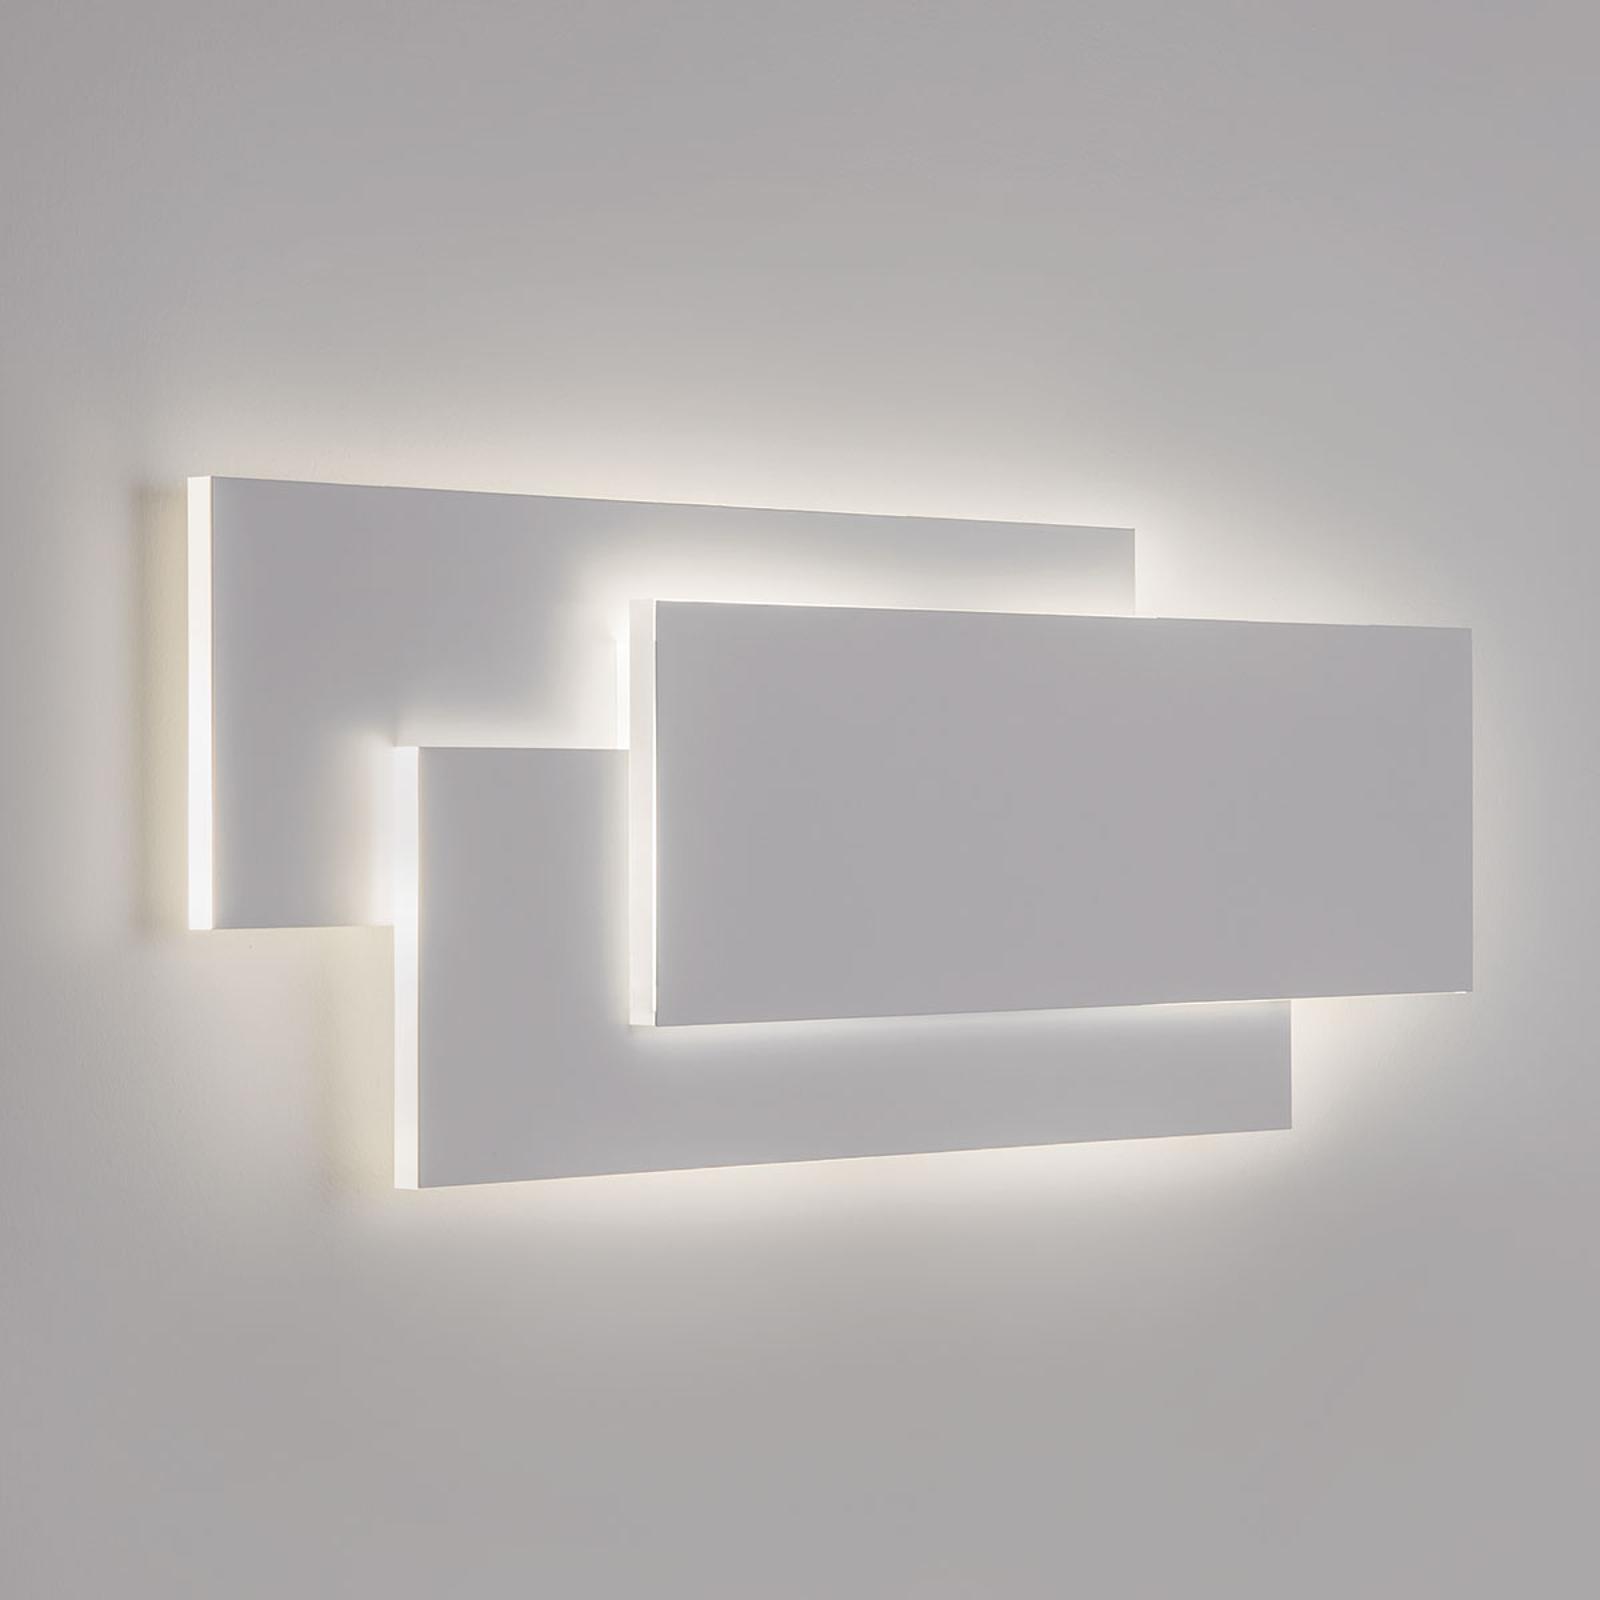 Acquista Applique a LED Edge bianca, design ultramoderno